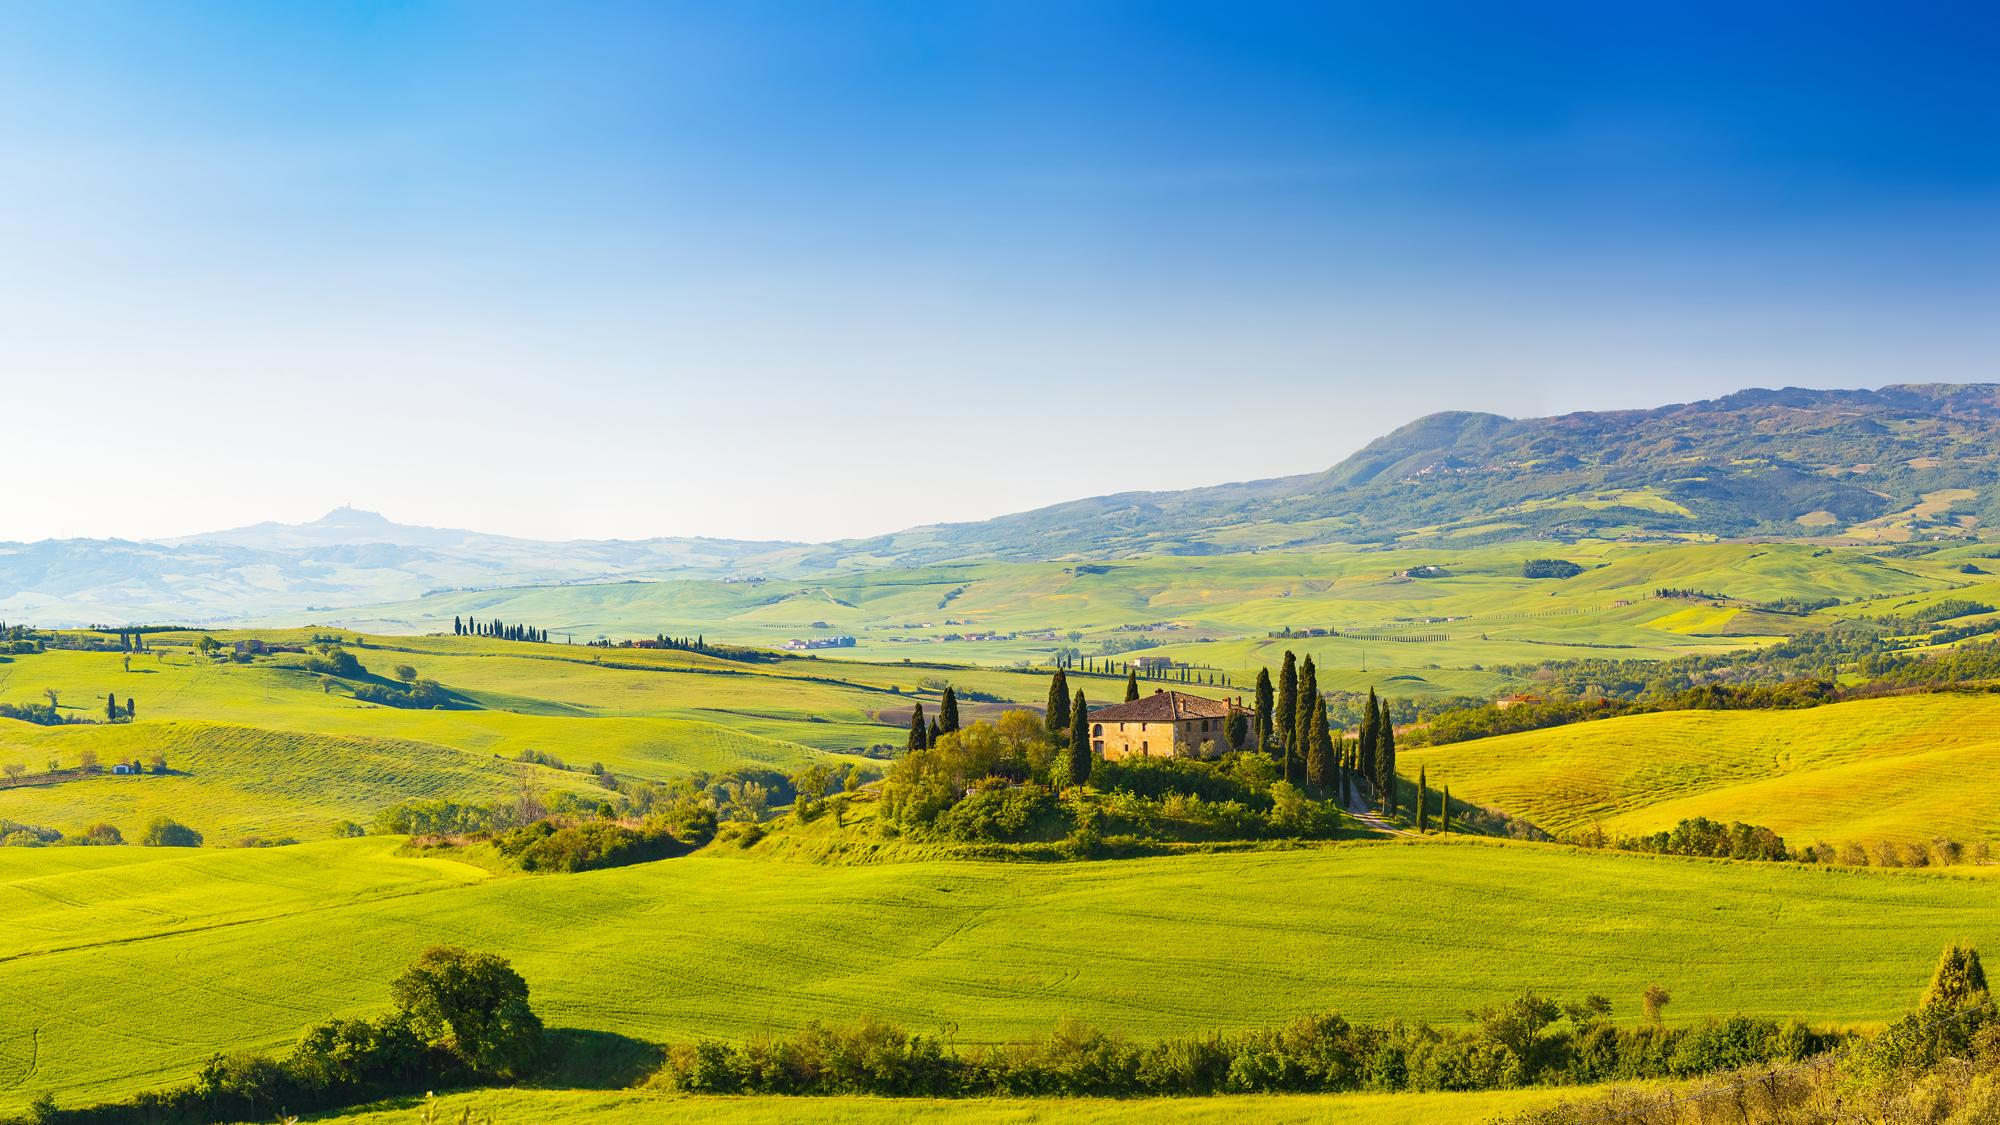 Hoe vindt u de ultieme agriturismo in Italië? - Agriturismo in Italië